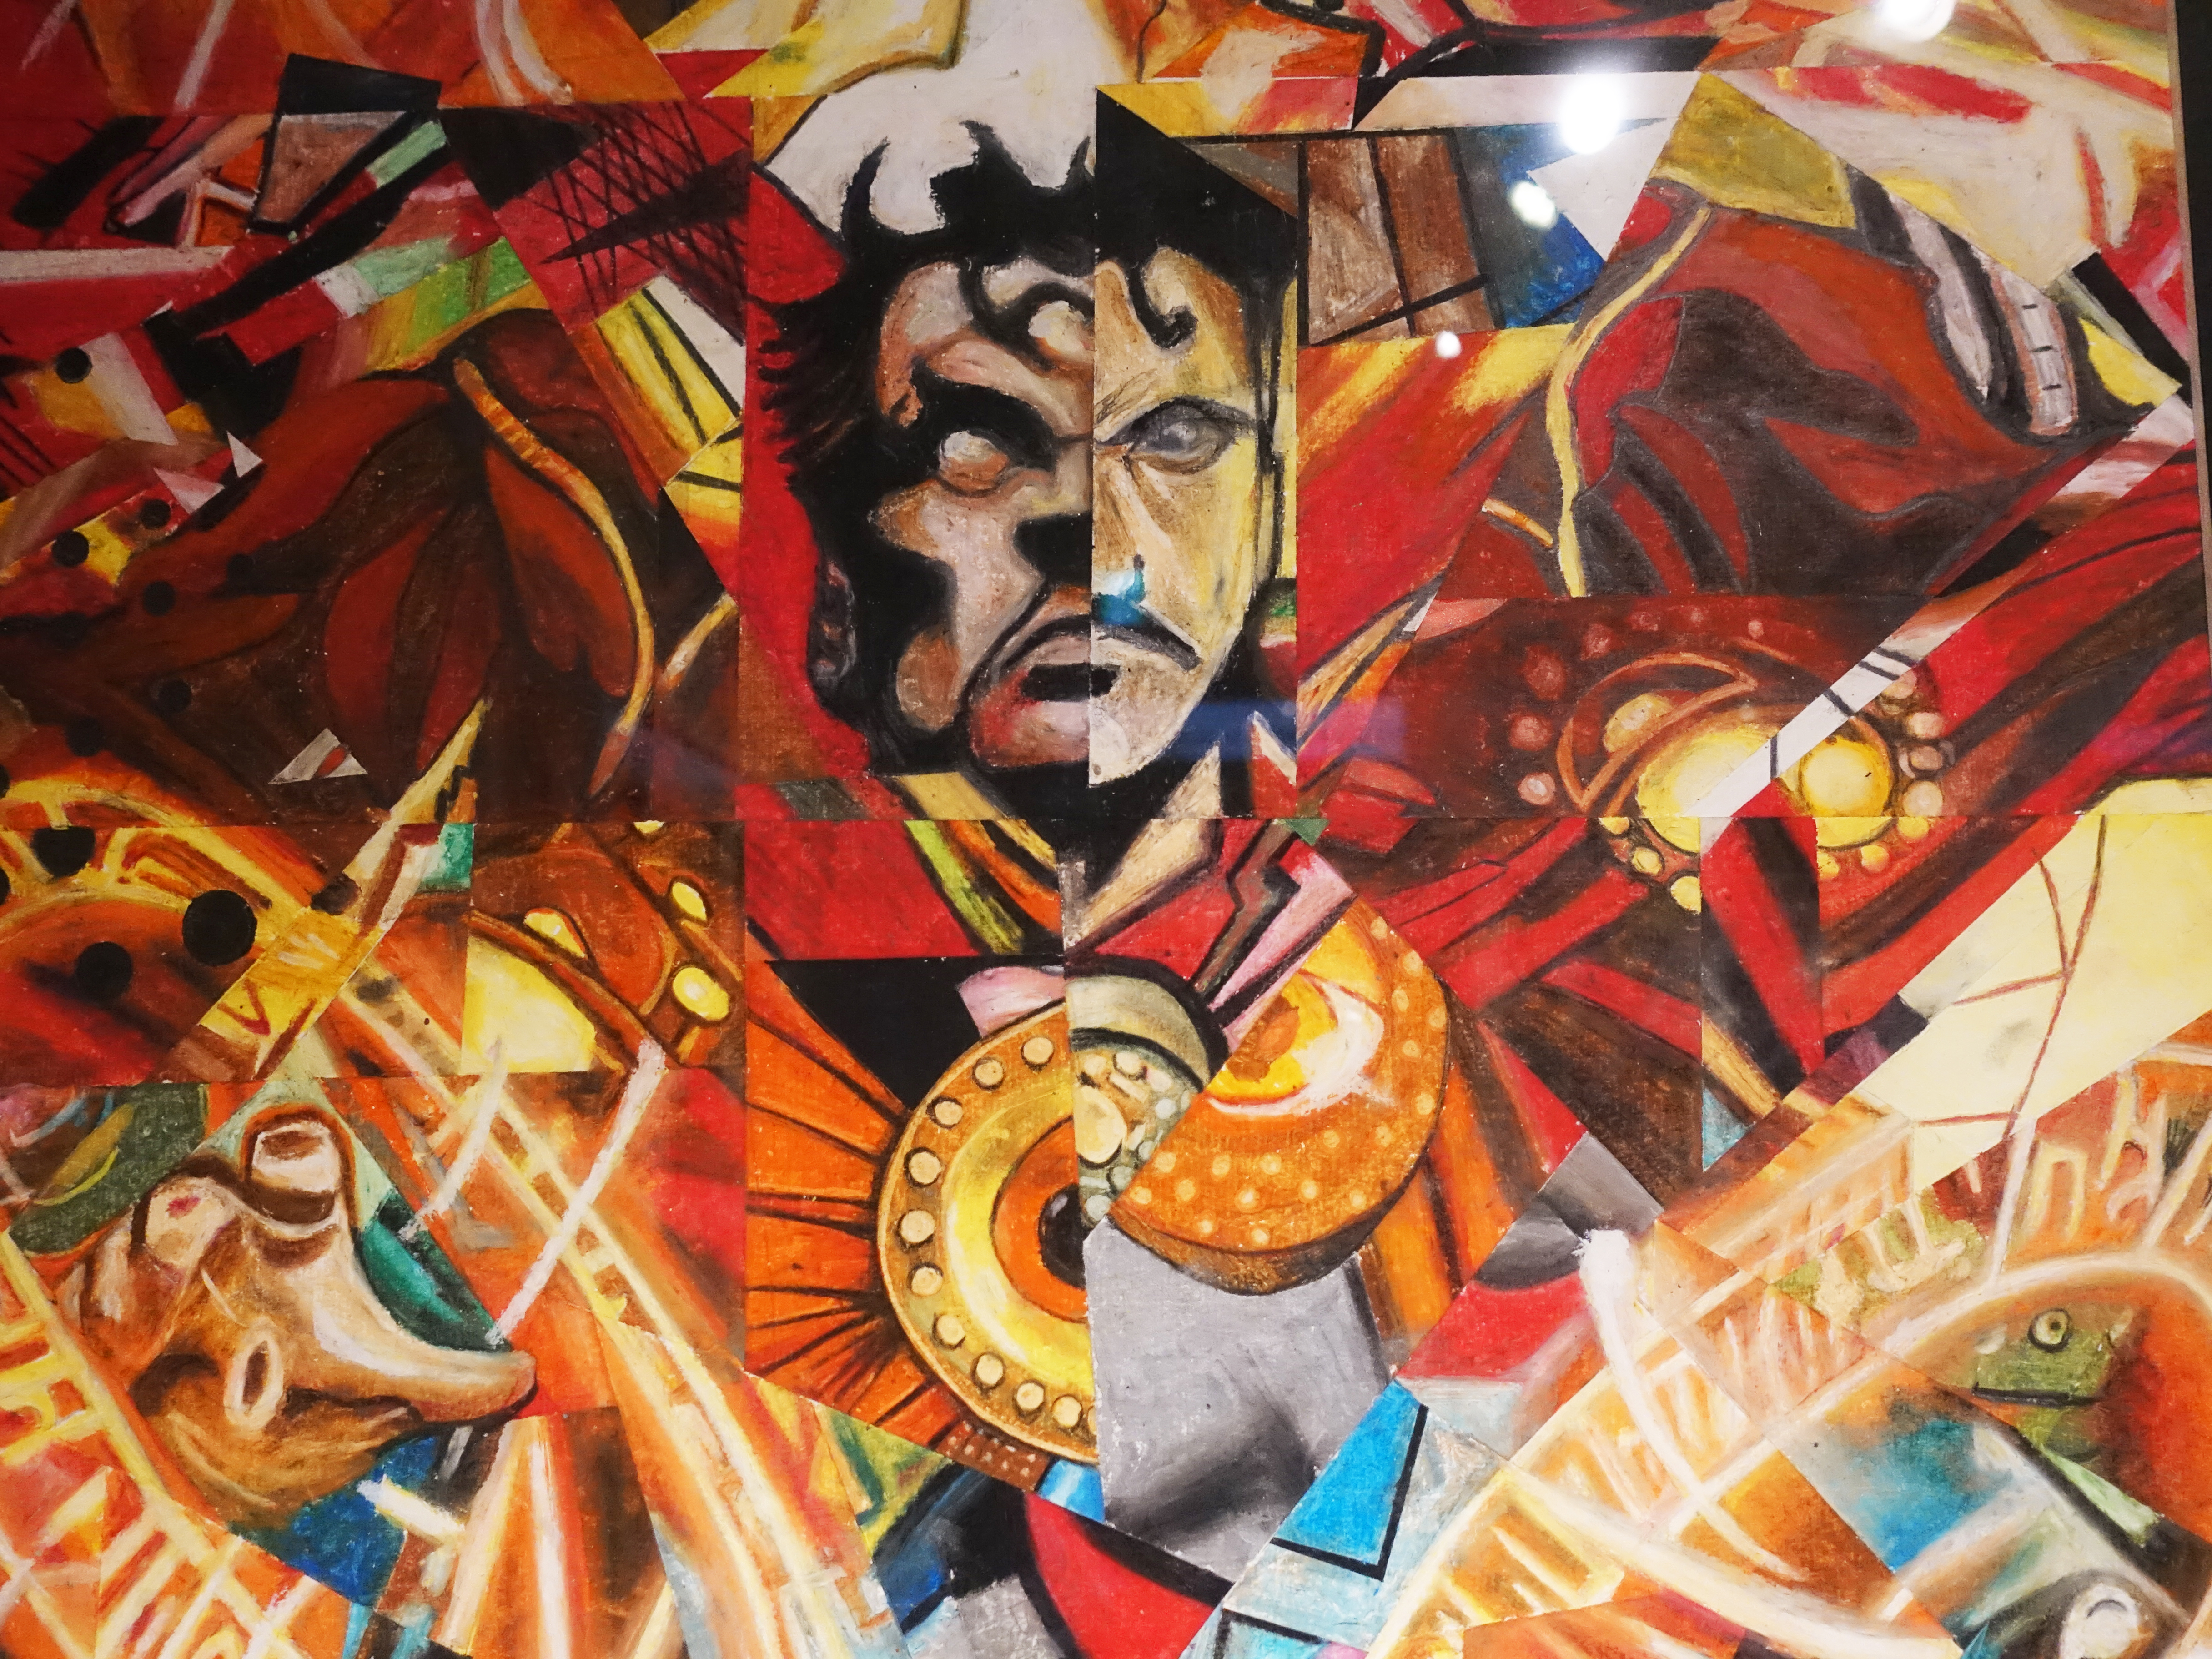 林俊良,《Under the impression of Dr.Strange》細節,110 x 61 cm,油畫棒繪於紙上。